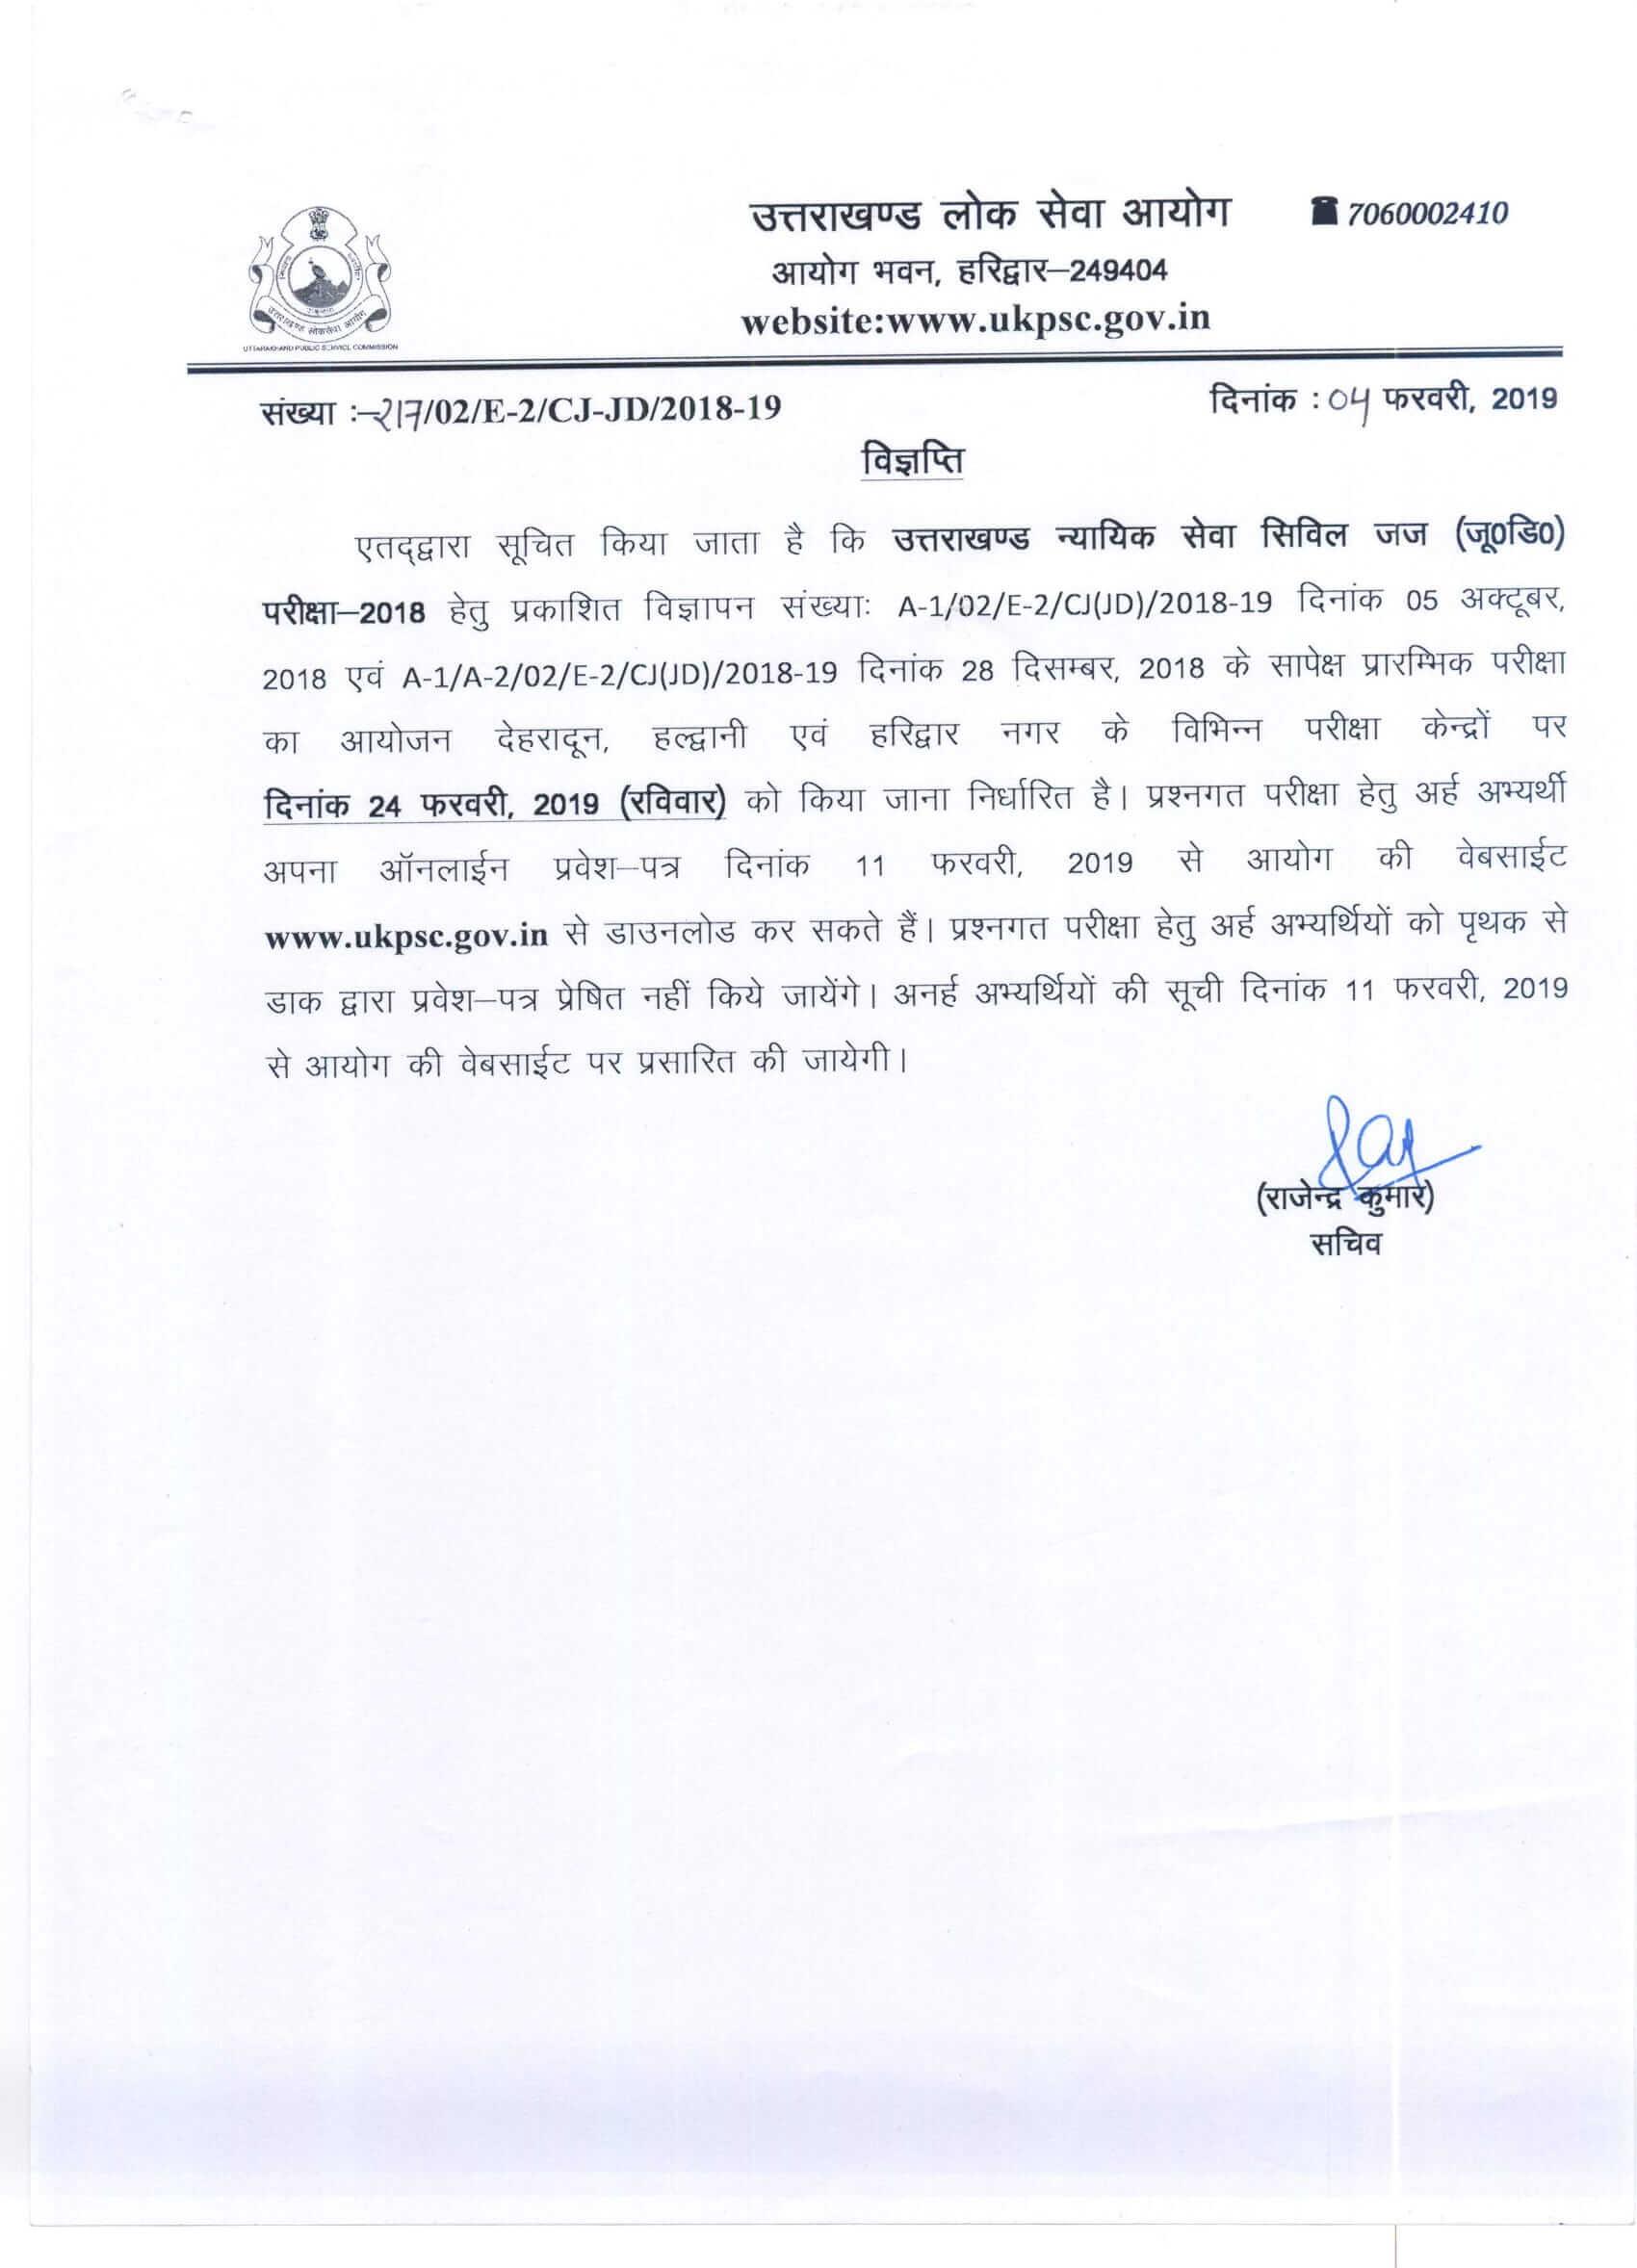 Civil Judge exam 2018 Admit Card Notification